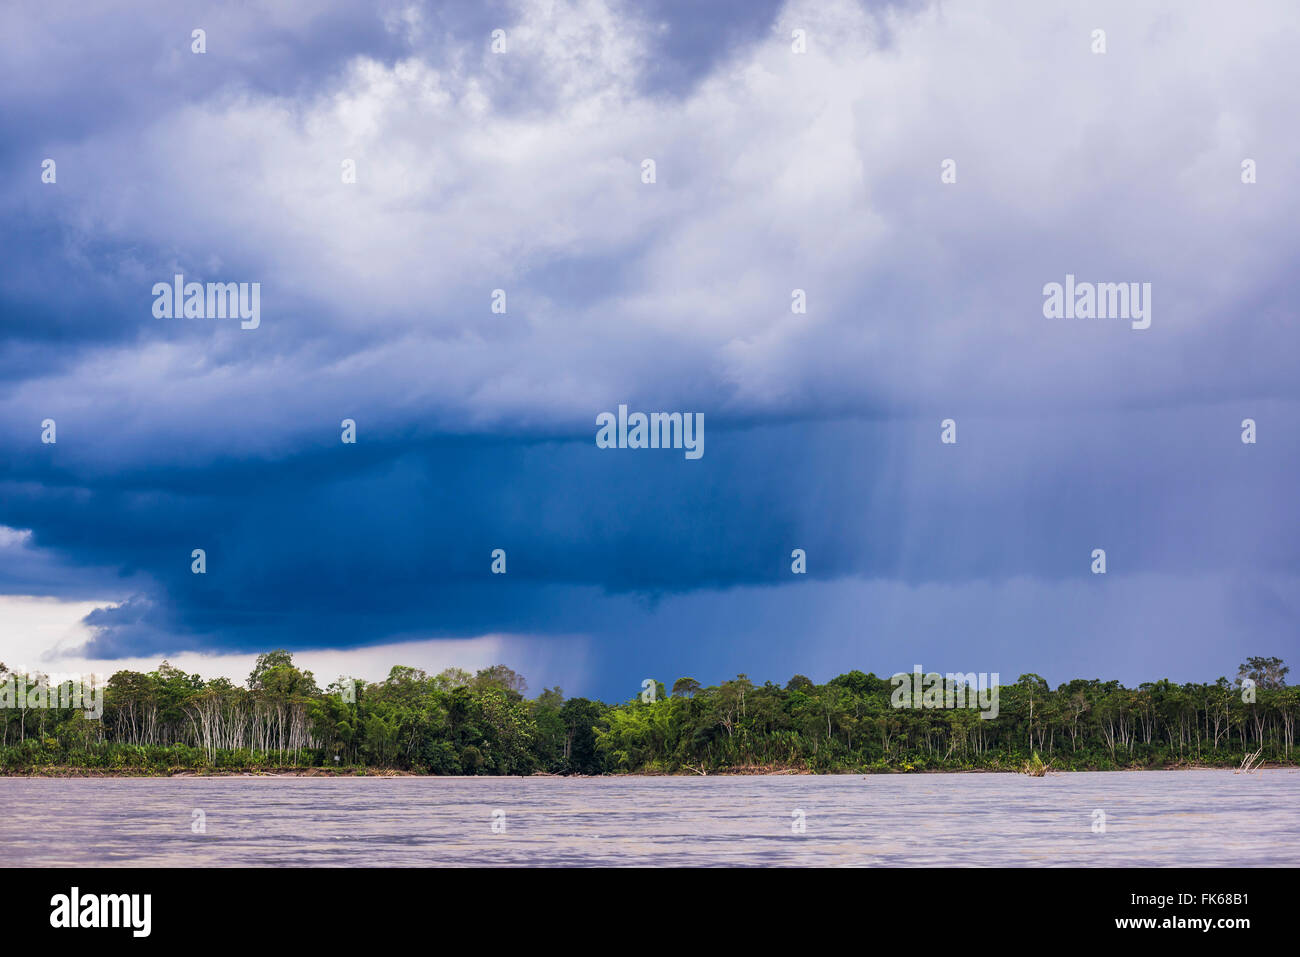 Amazonas-Regenwald Sturm, Coca, Ecuador, Südamerika Stockbild